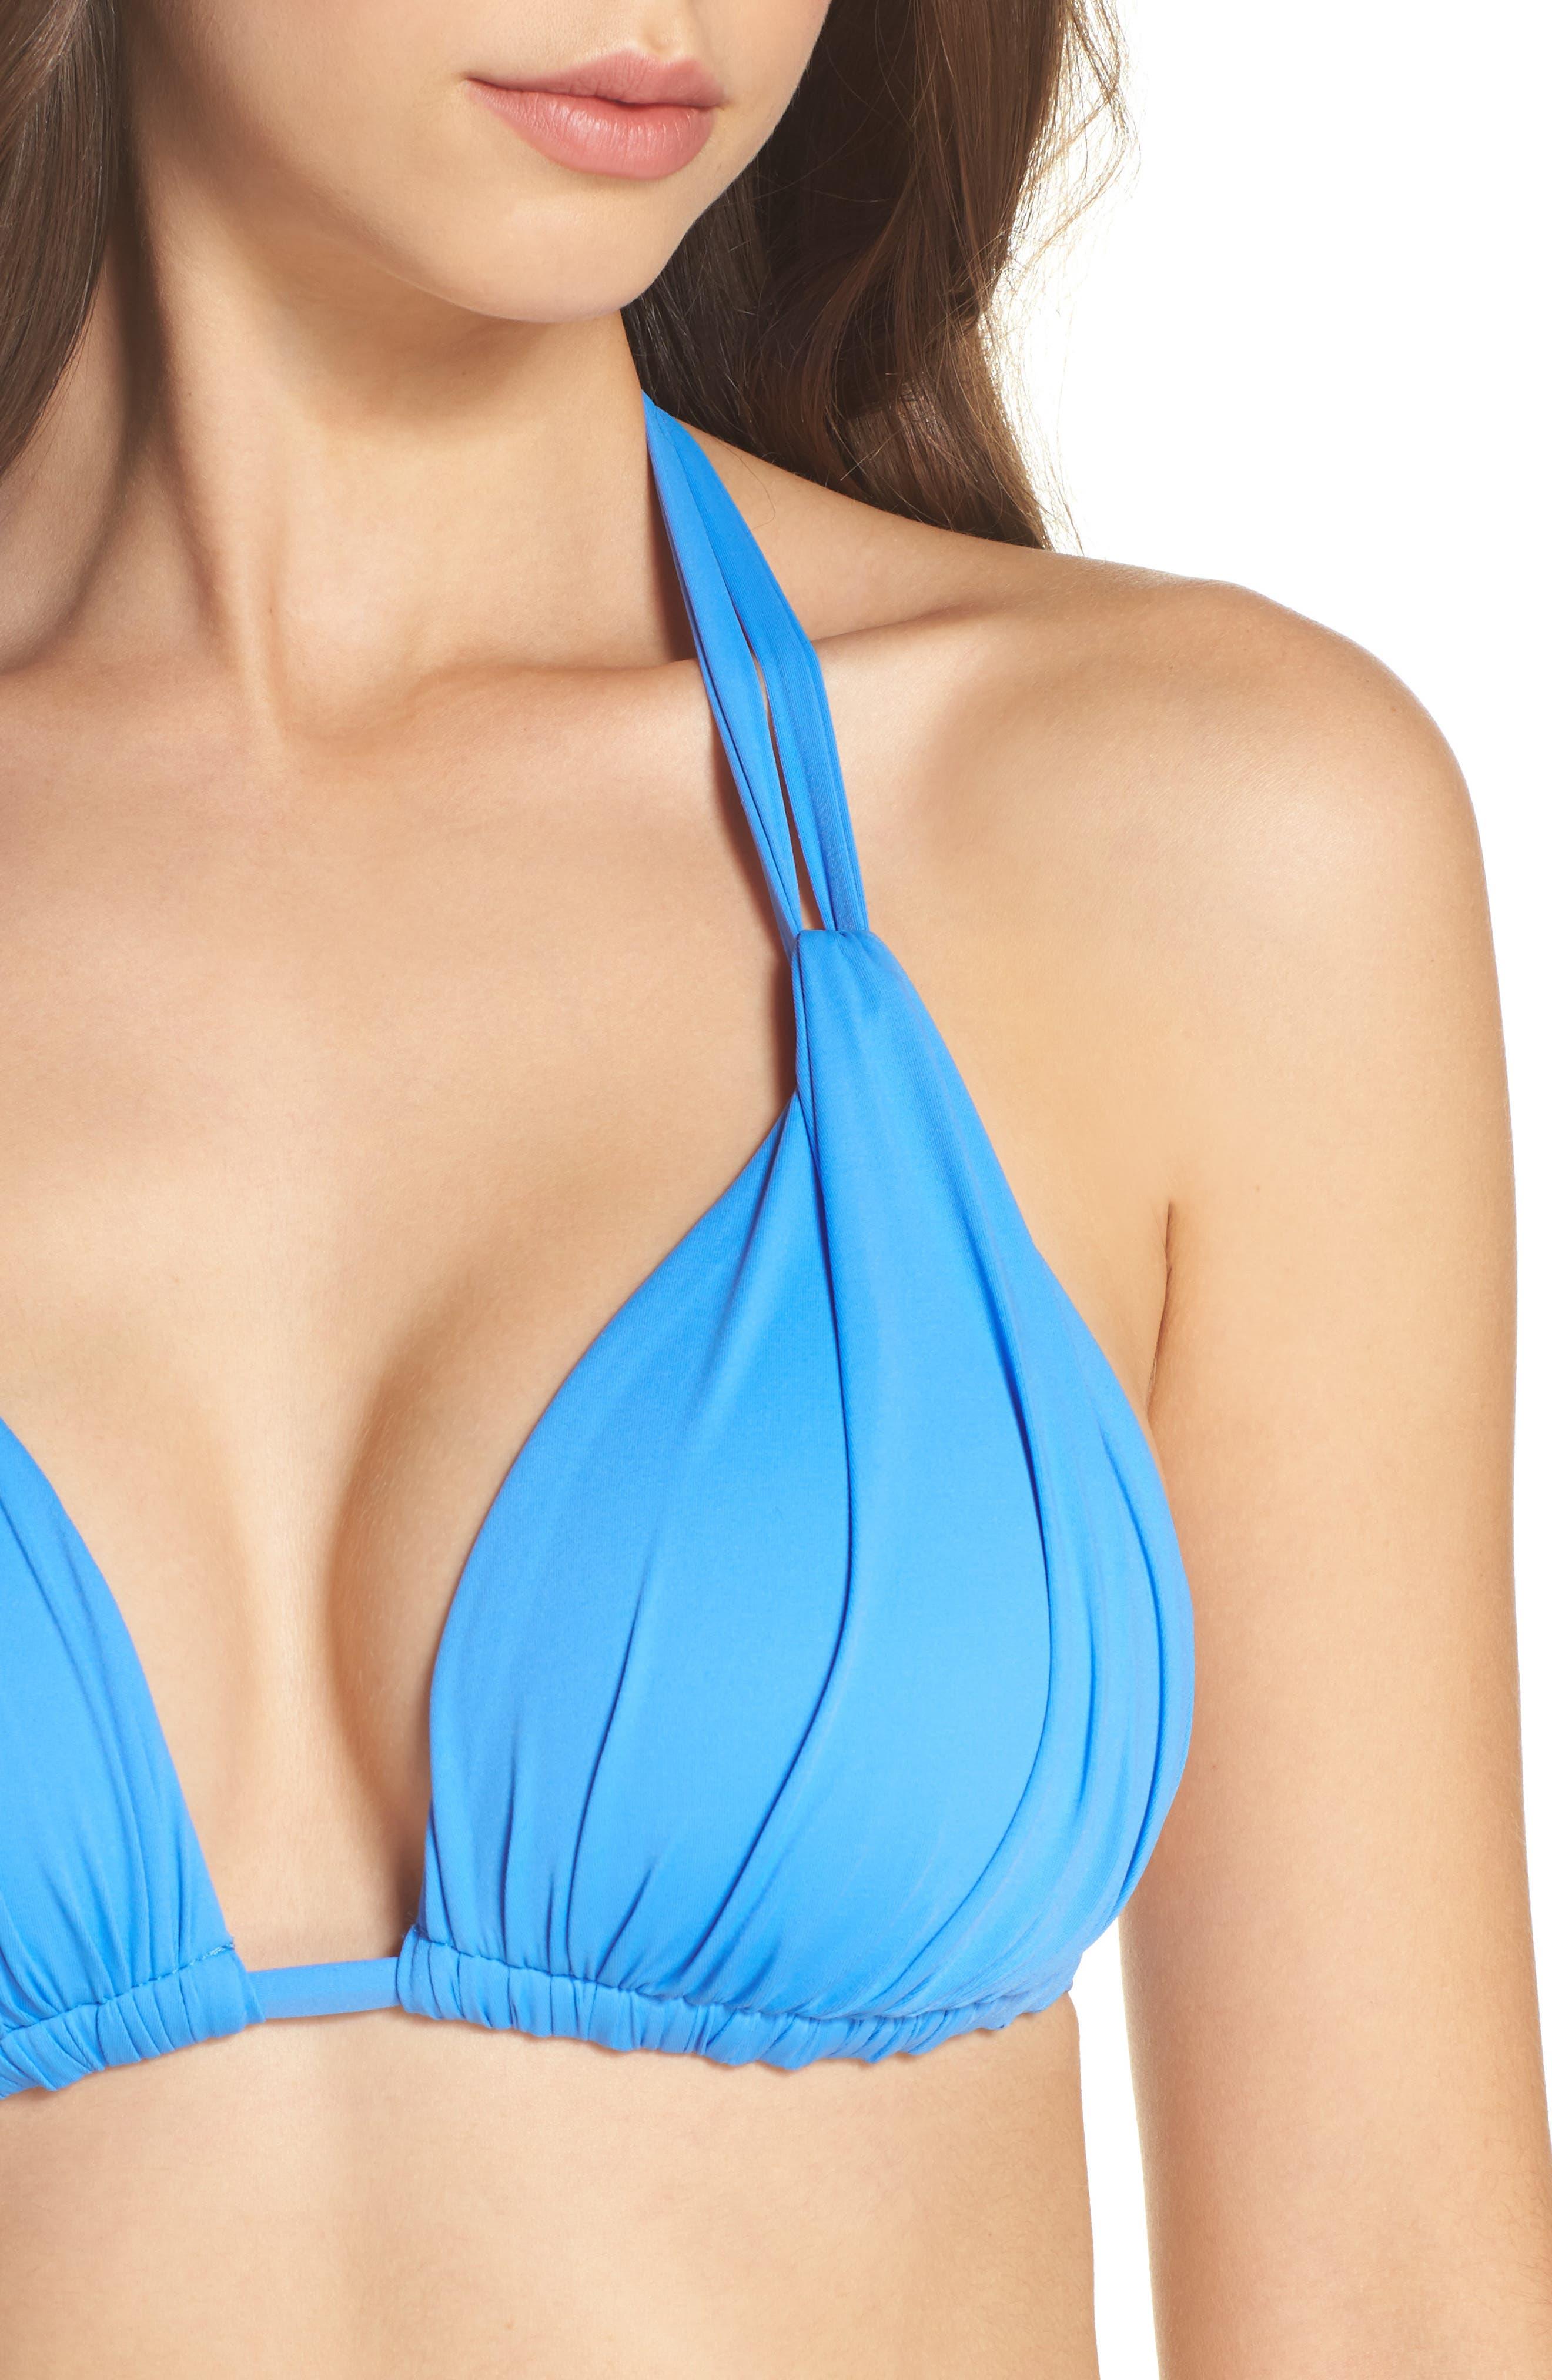 Island Blanca Halter Bikini Top,                             Alternate thumbnail 8, color,                             Blue Suede